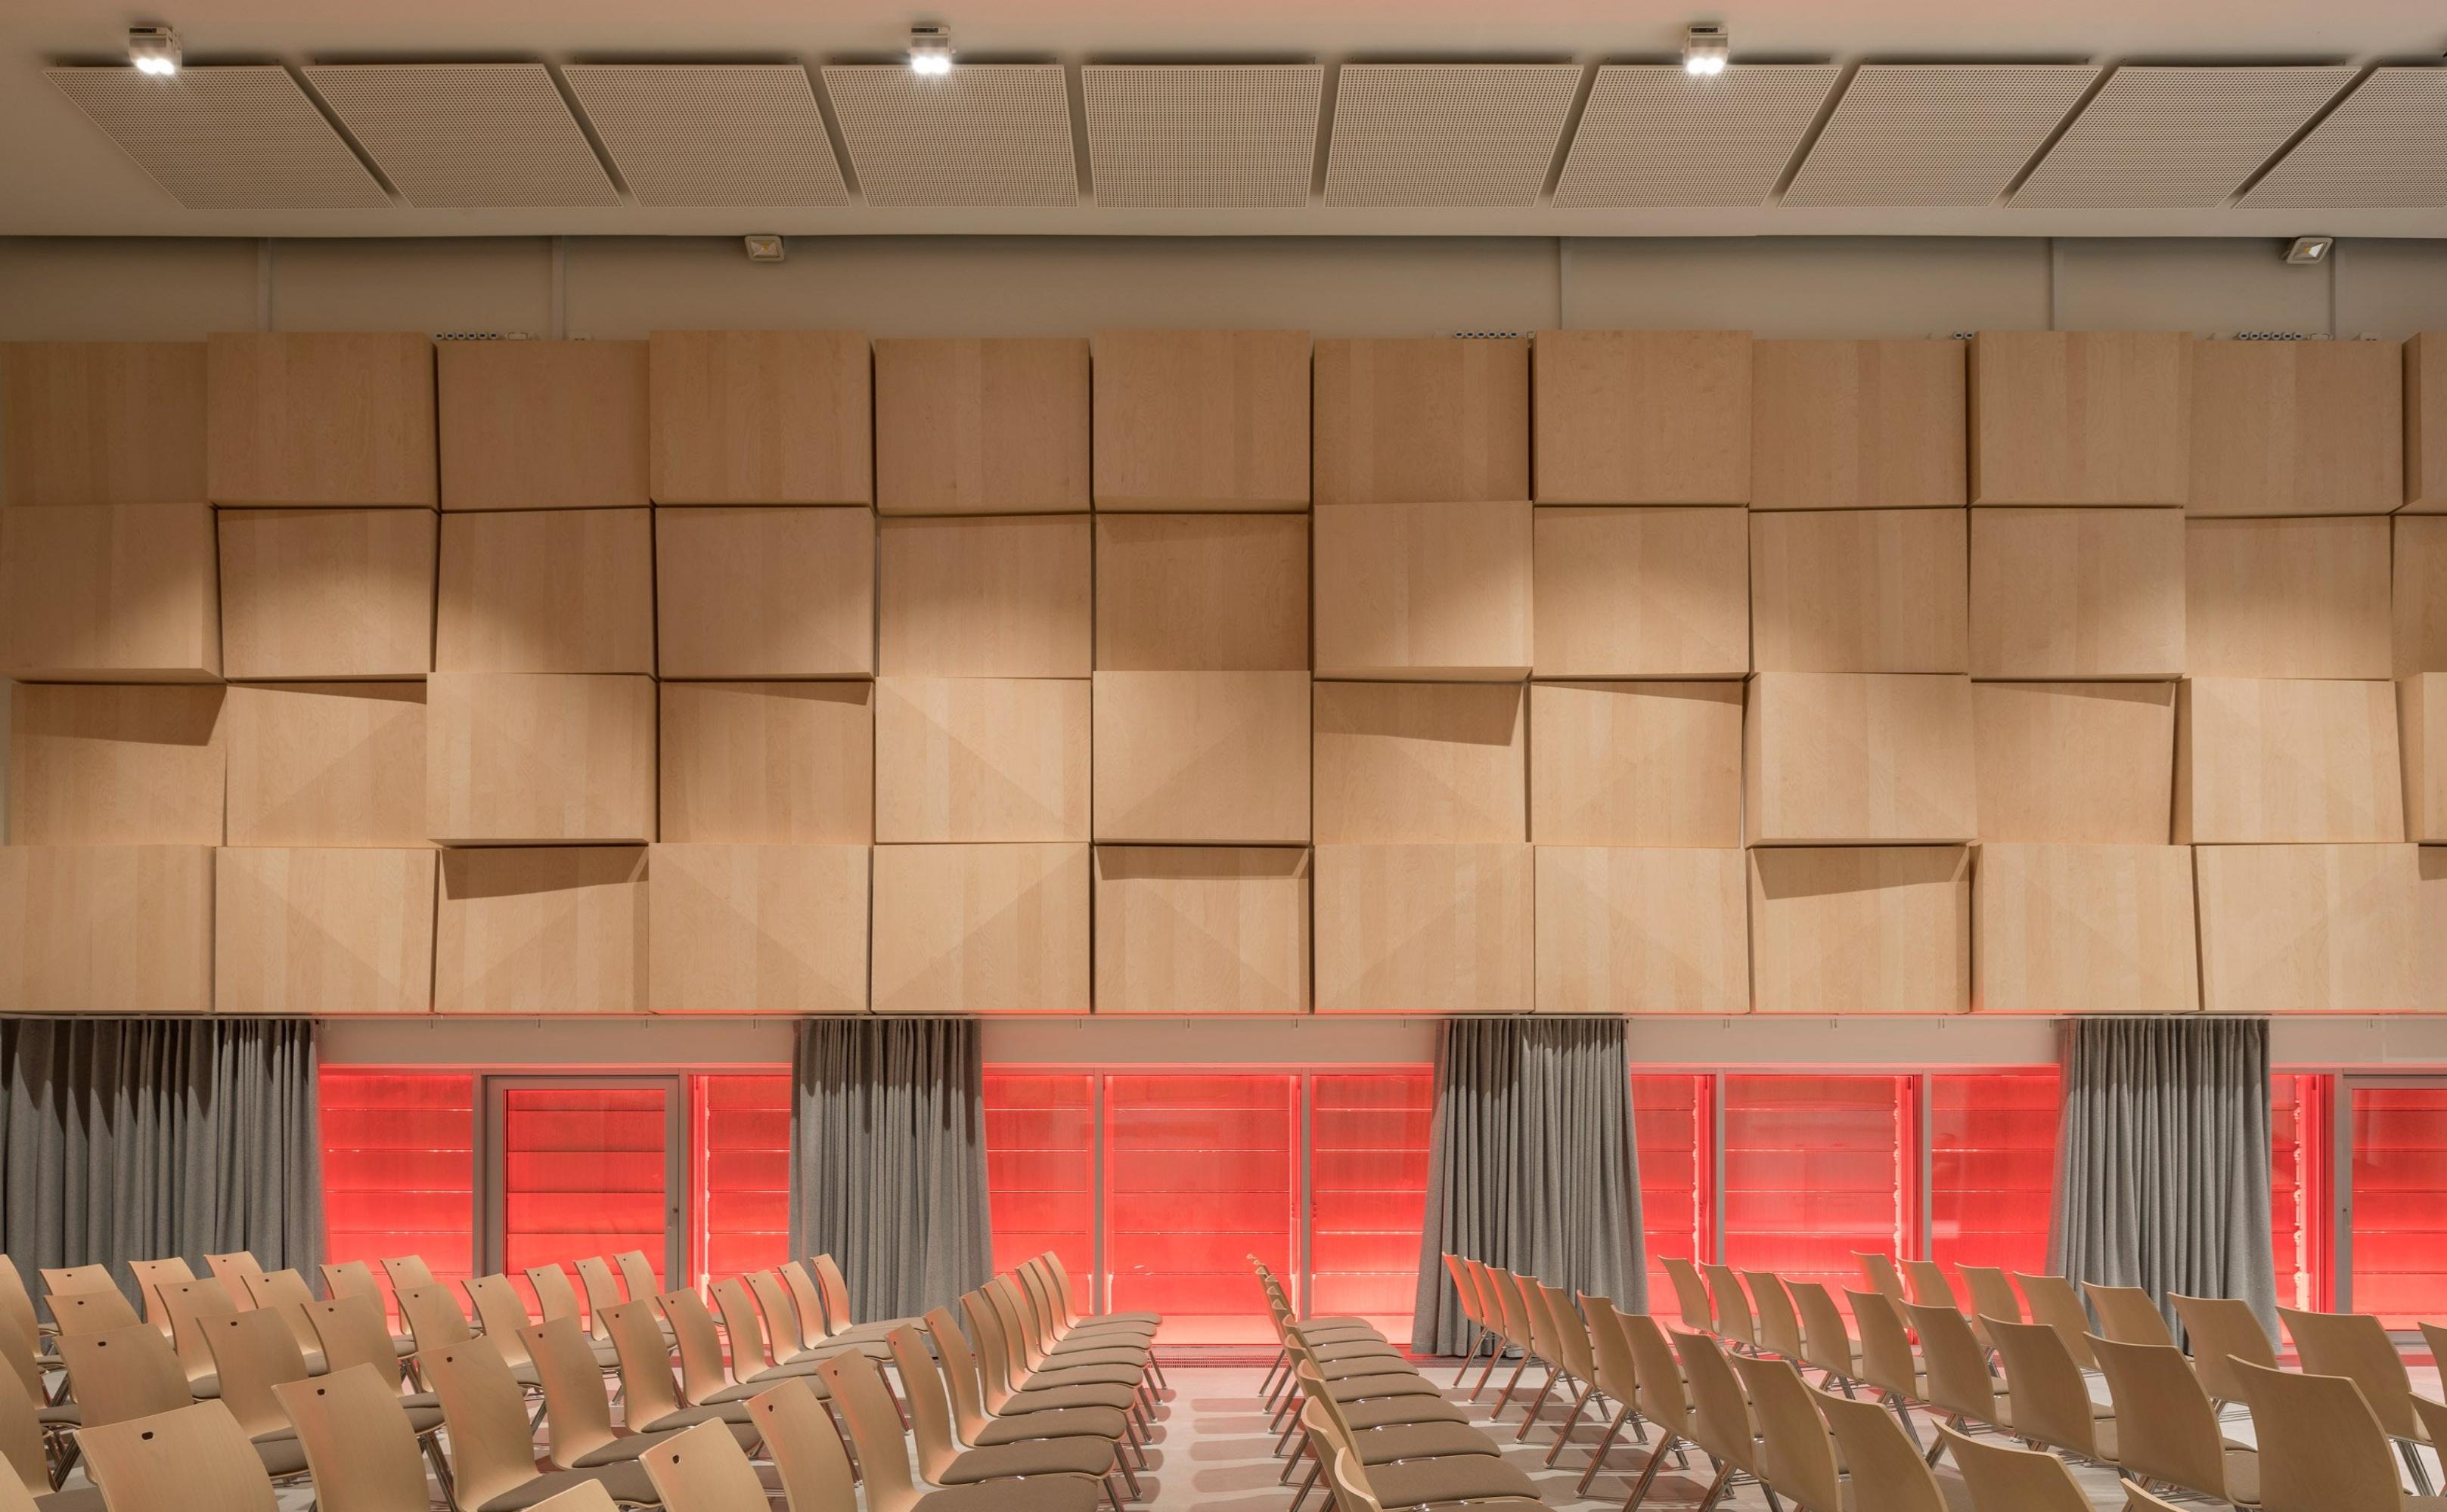 vendsyssel-theatre-schmidt-hammer-lassen-architects-hjorring-denmark-architecture-cultural_dezeen_2364_col_13